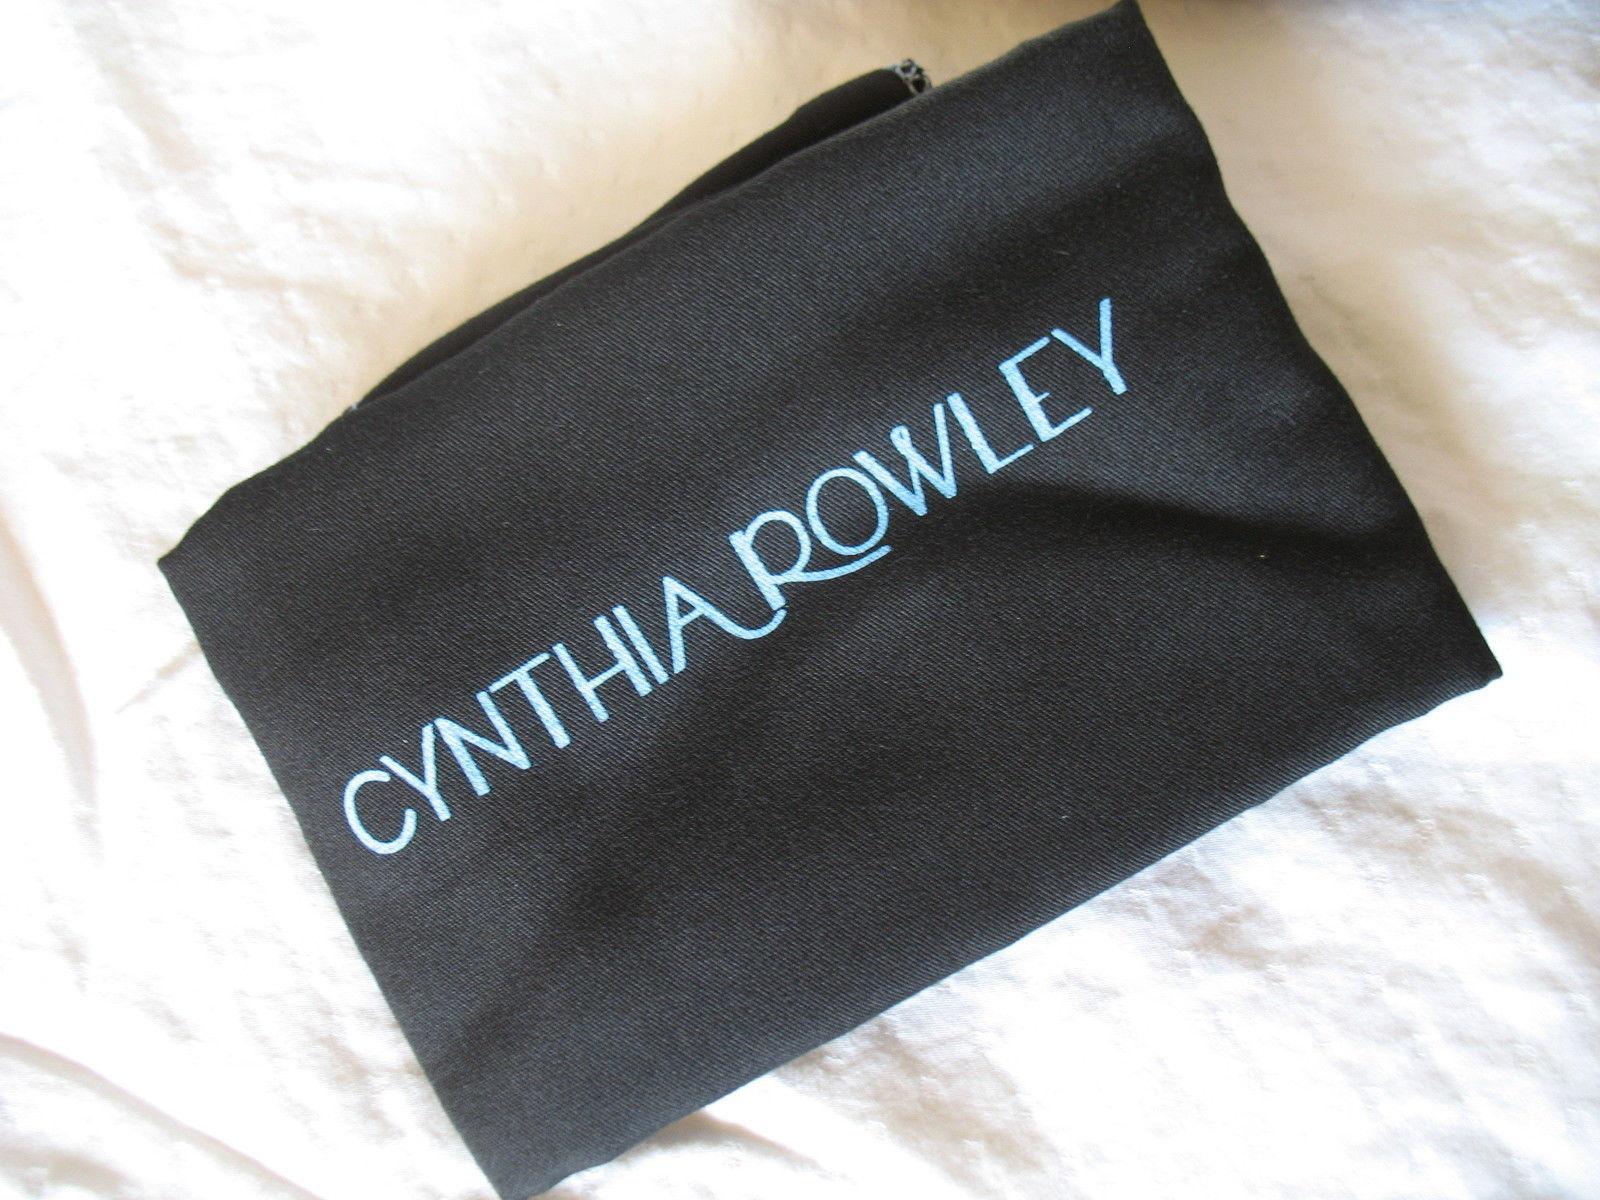 Cynthia Rowley New Purse Handbag Leather Crossbody Calloway Orange Coral White image 8